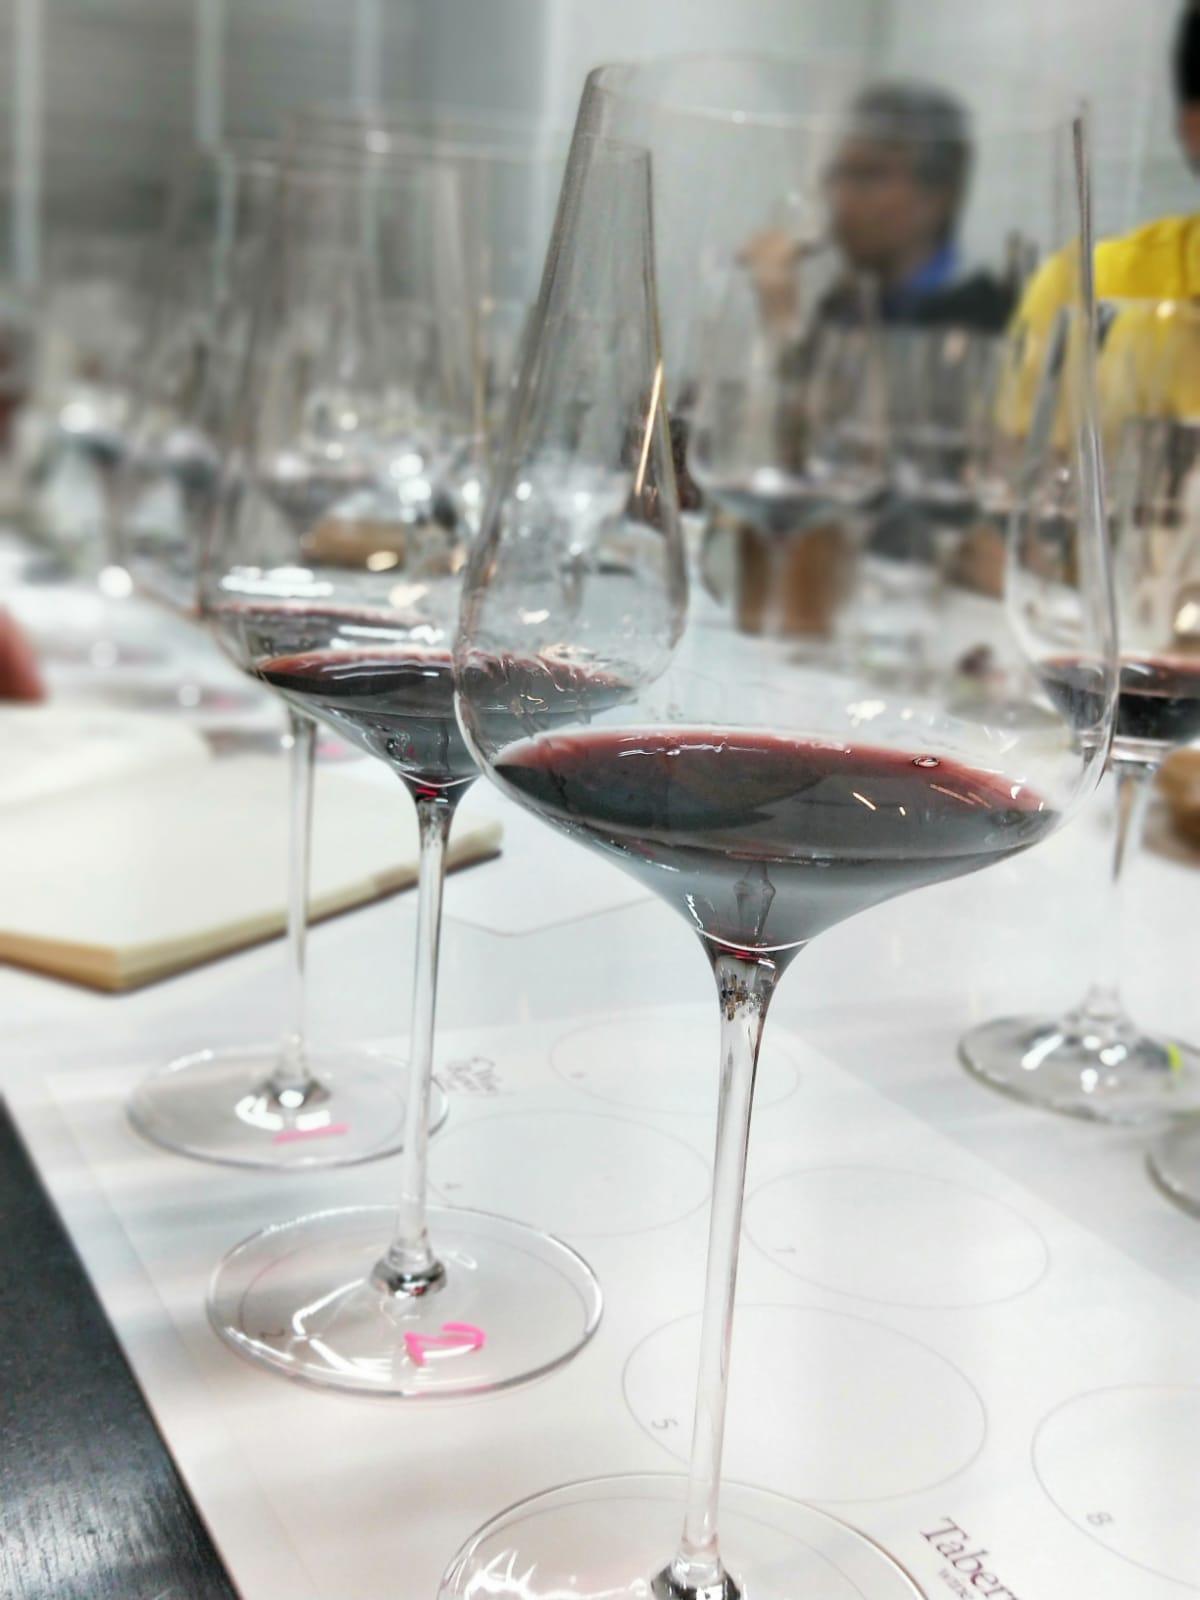 Singapore Wine Appreciation Group